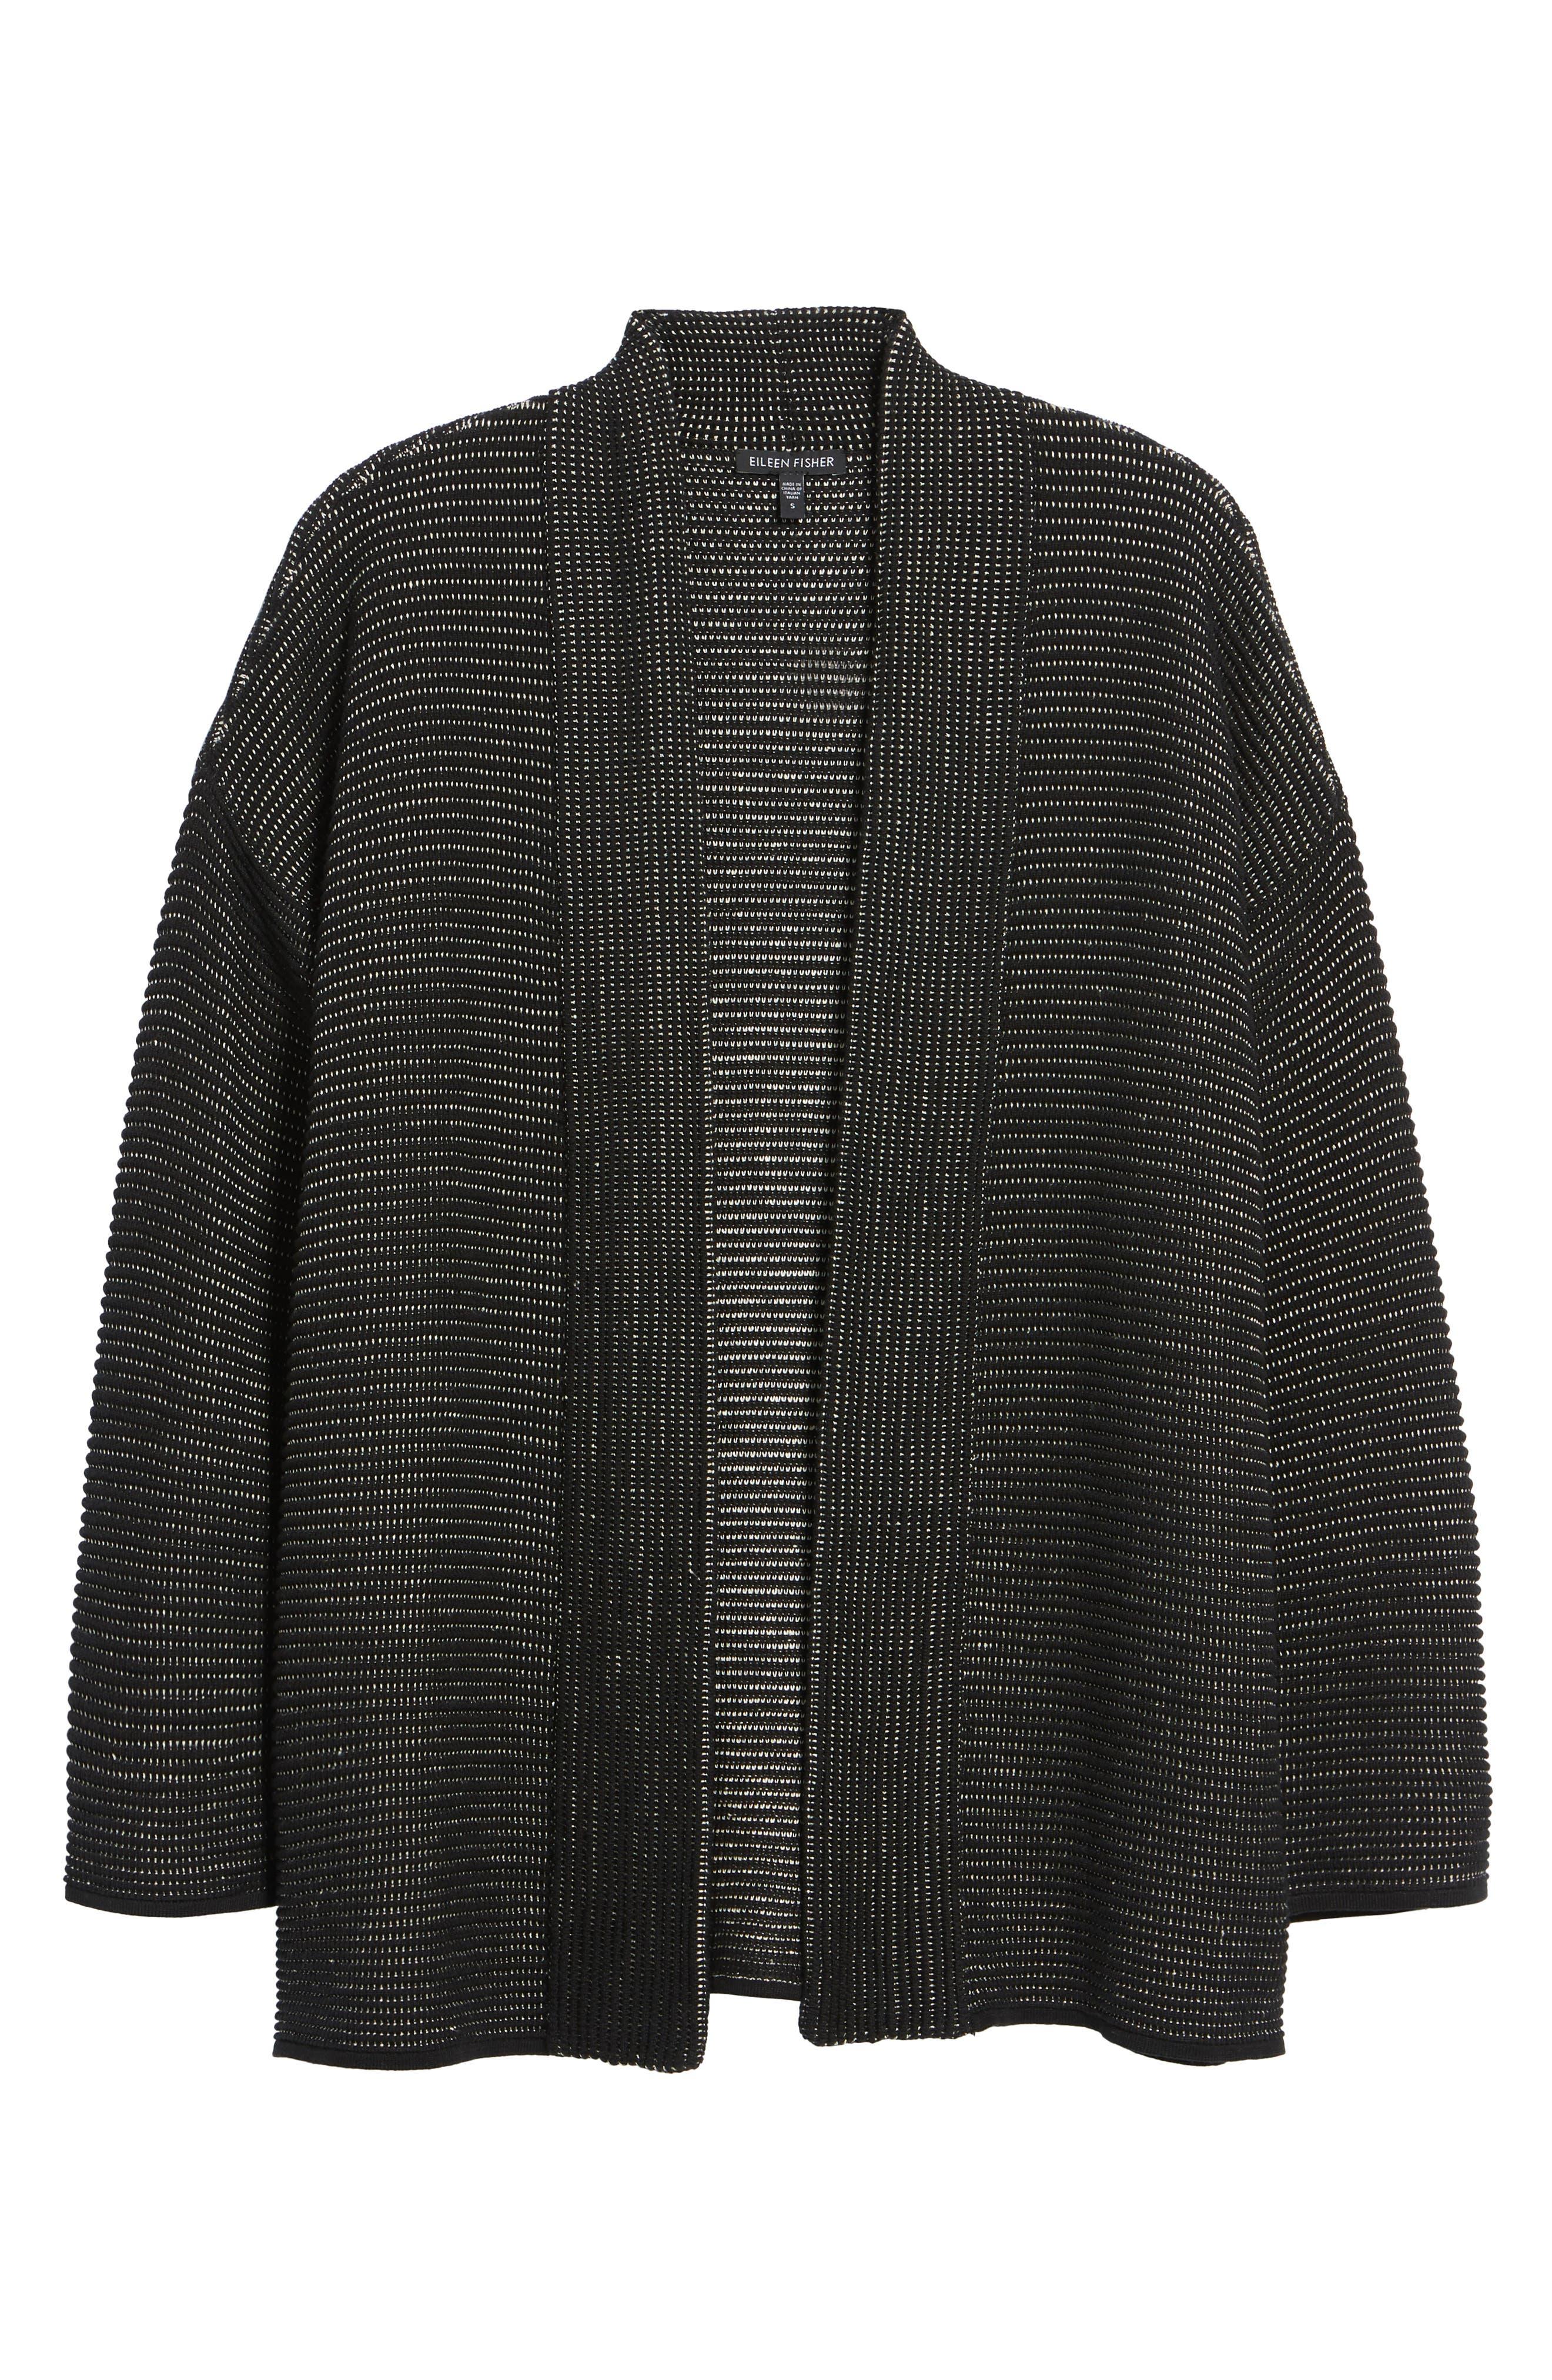 Silk Blend Ottoman Knit Cardigan,                             Alternate thumbnail 6, color,                             Black Natural